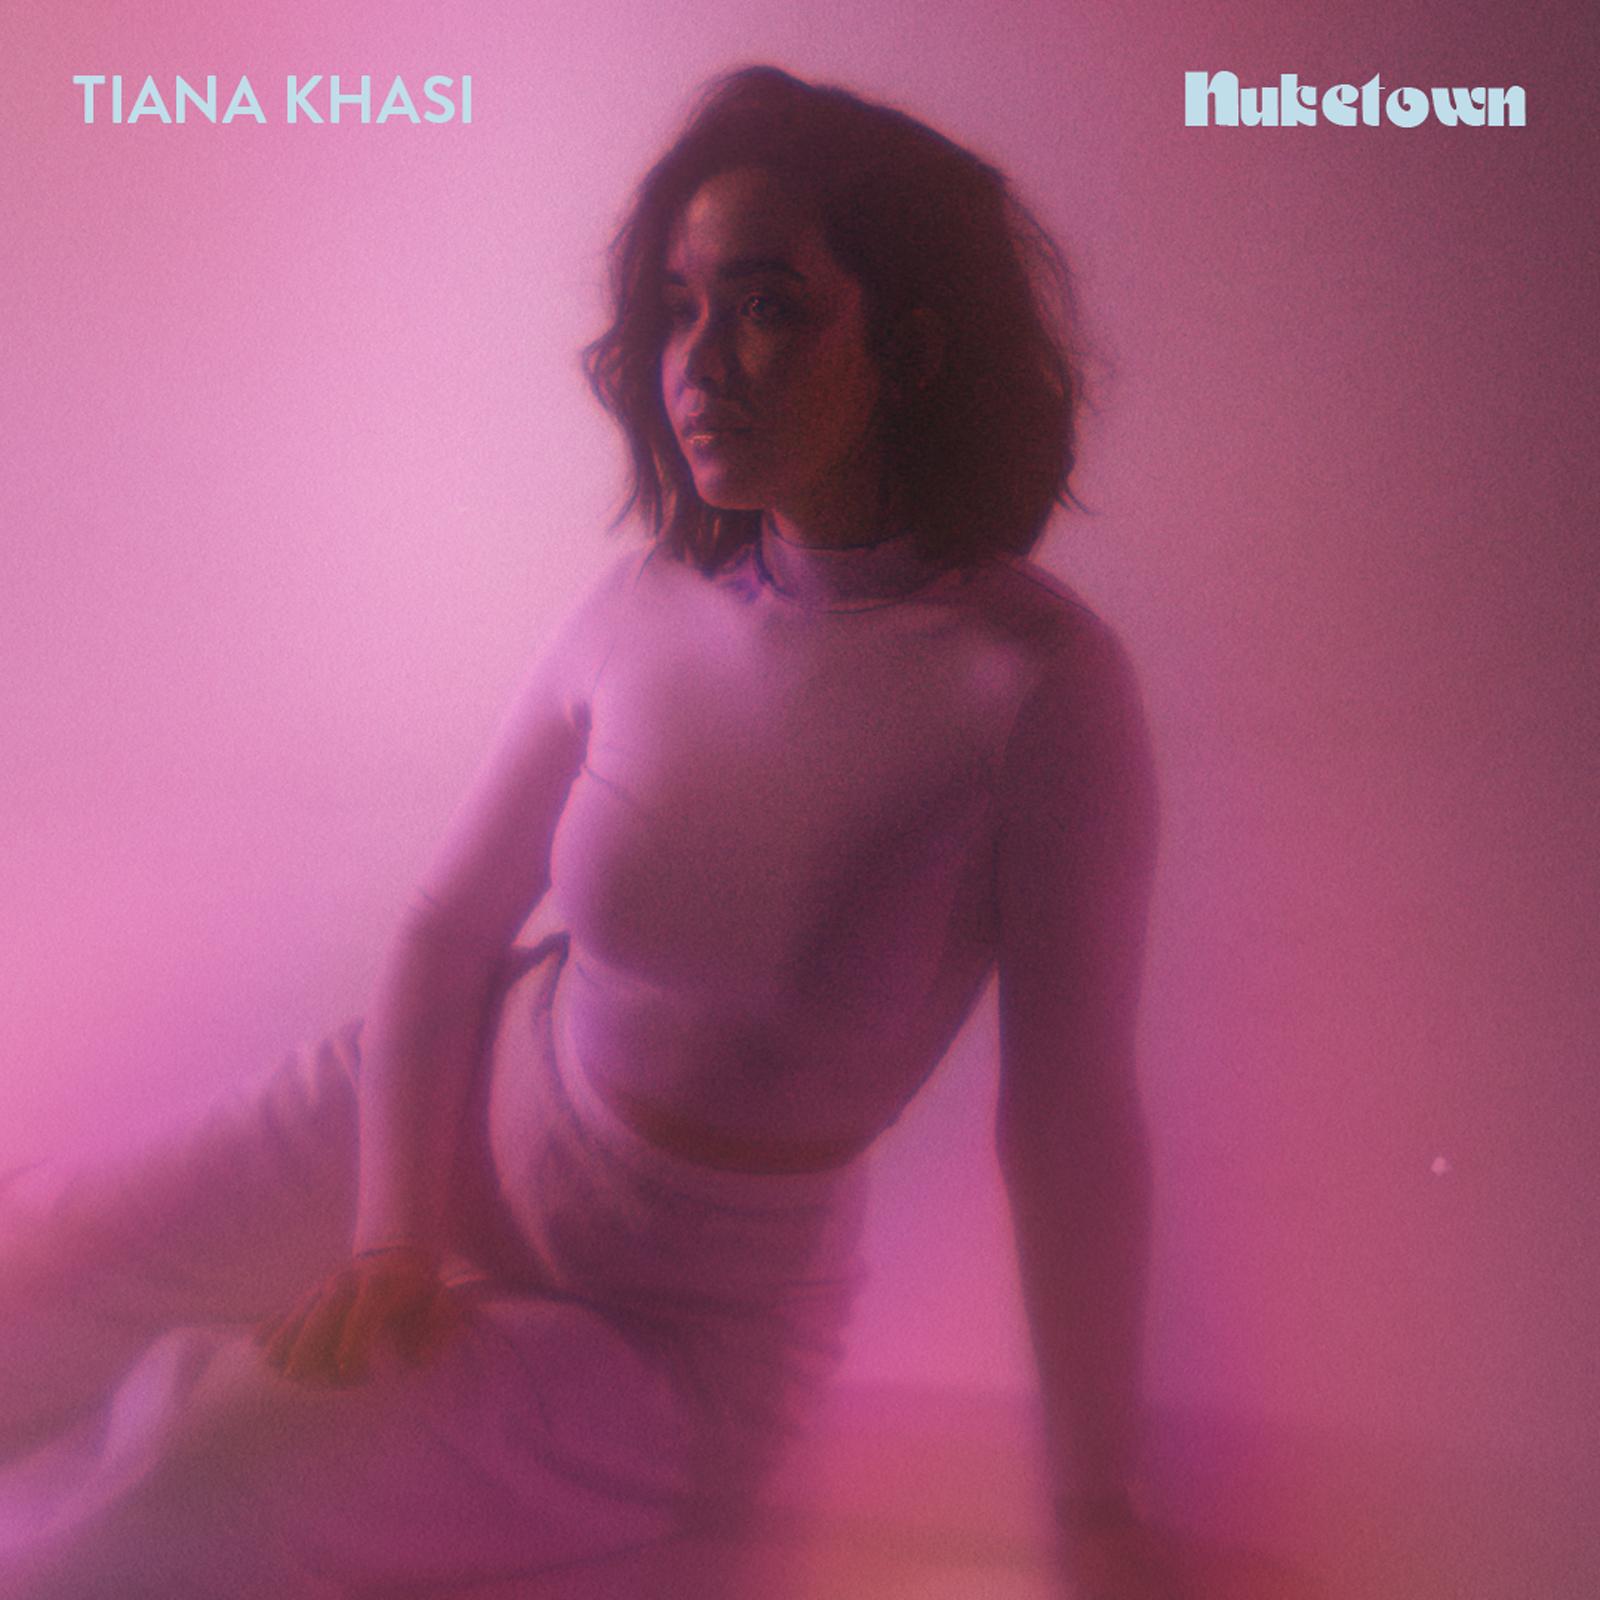 TianaKhasi_Nuketown_cover.jpg